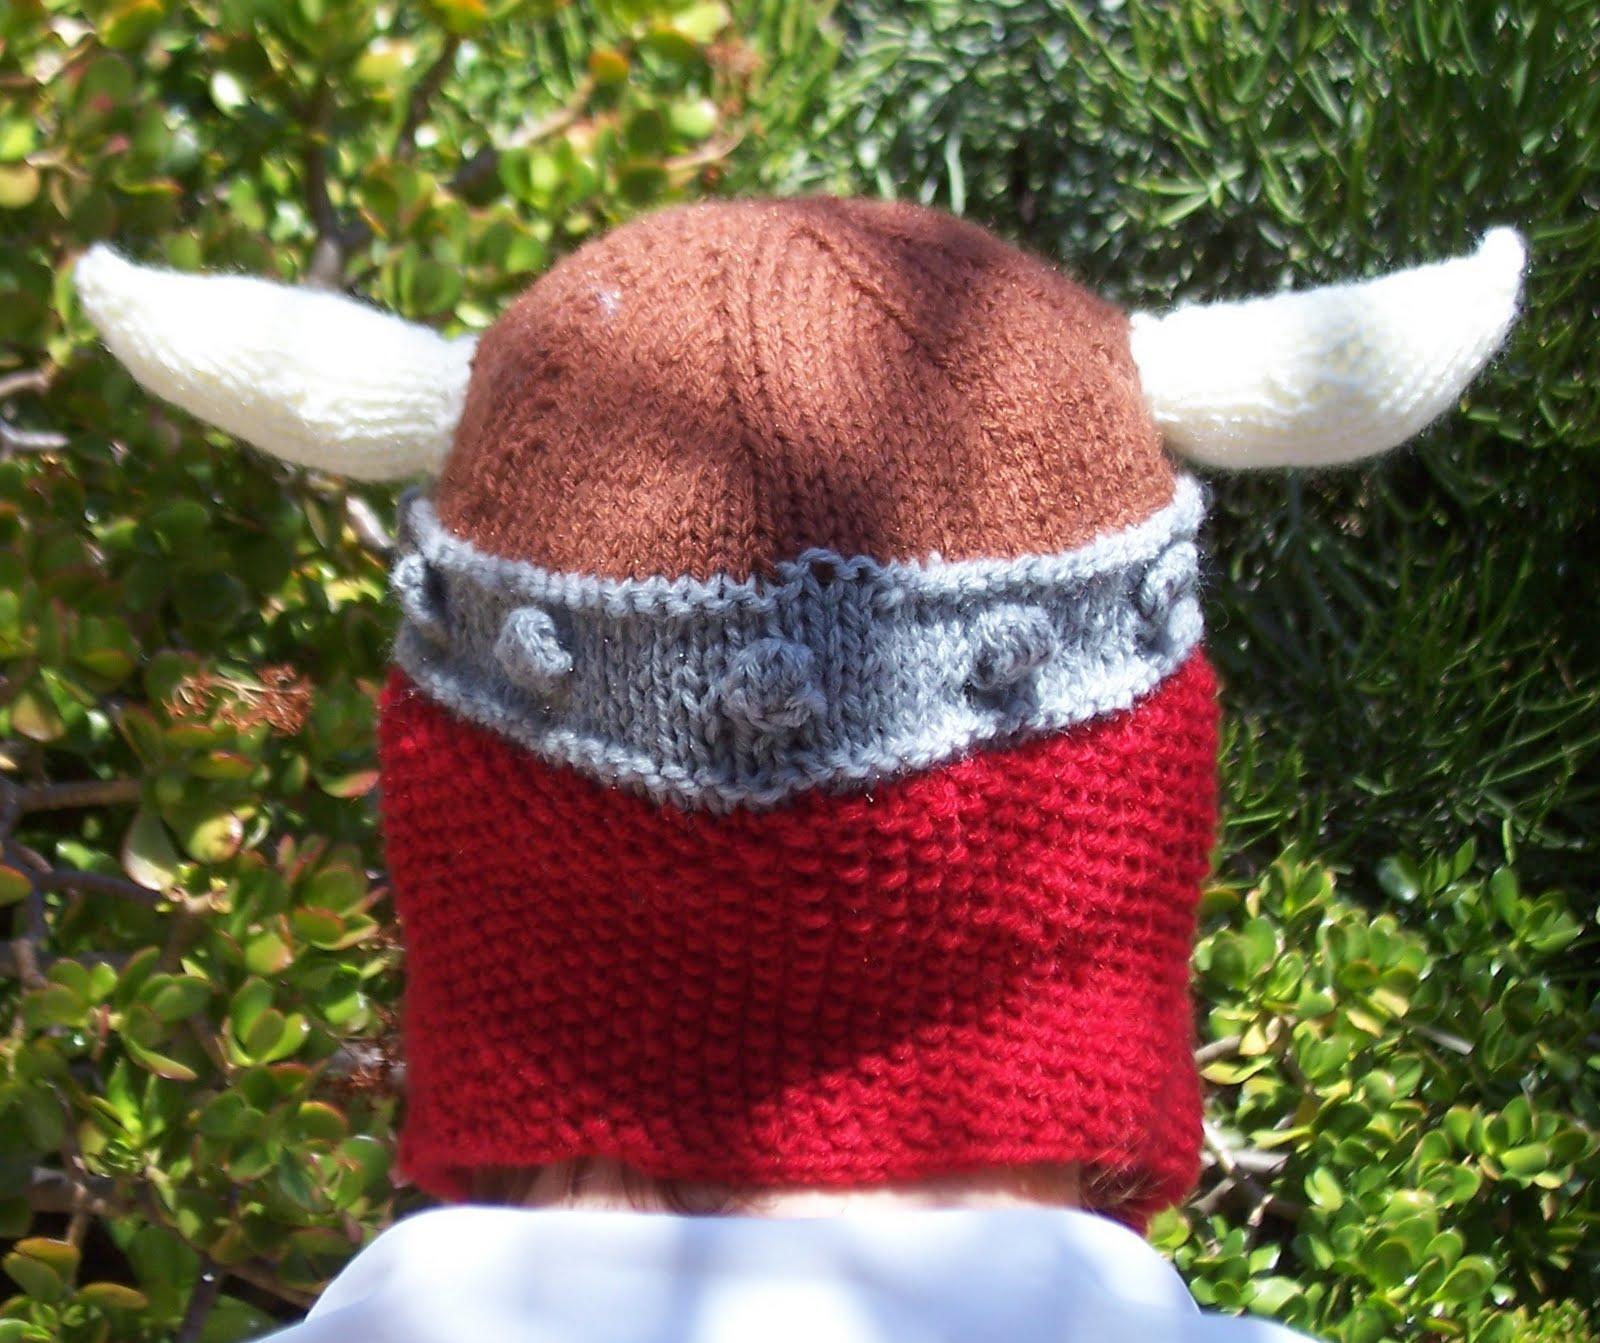 The Crafty Knitty Gritty: Viking Balaclava